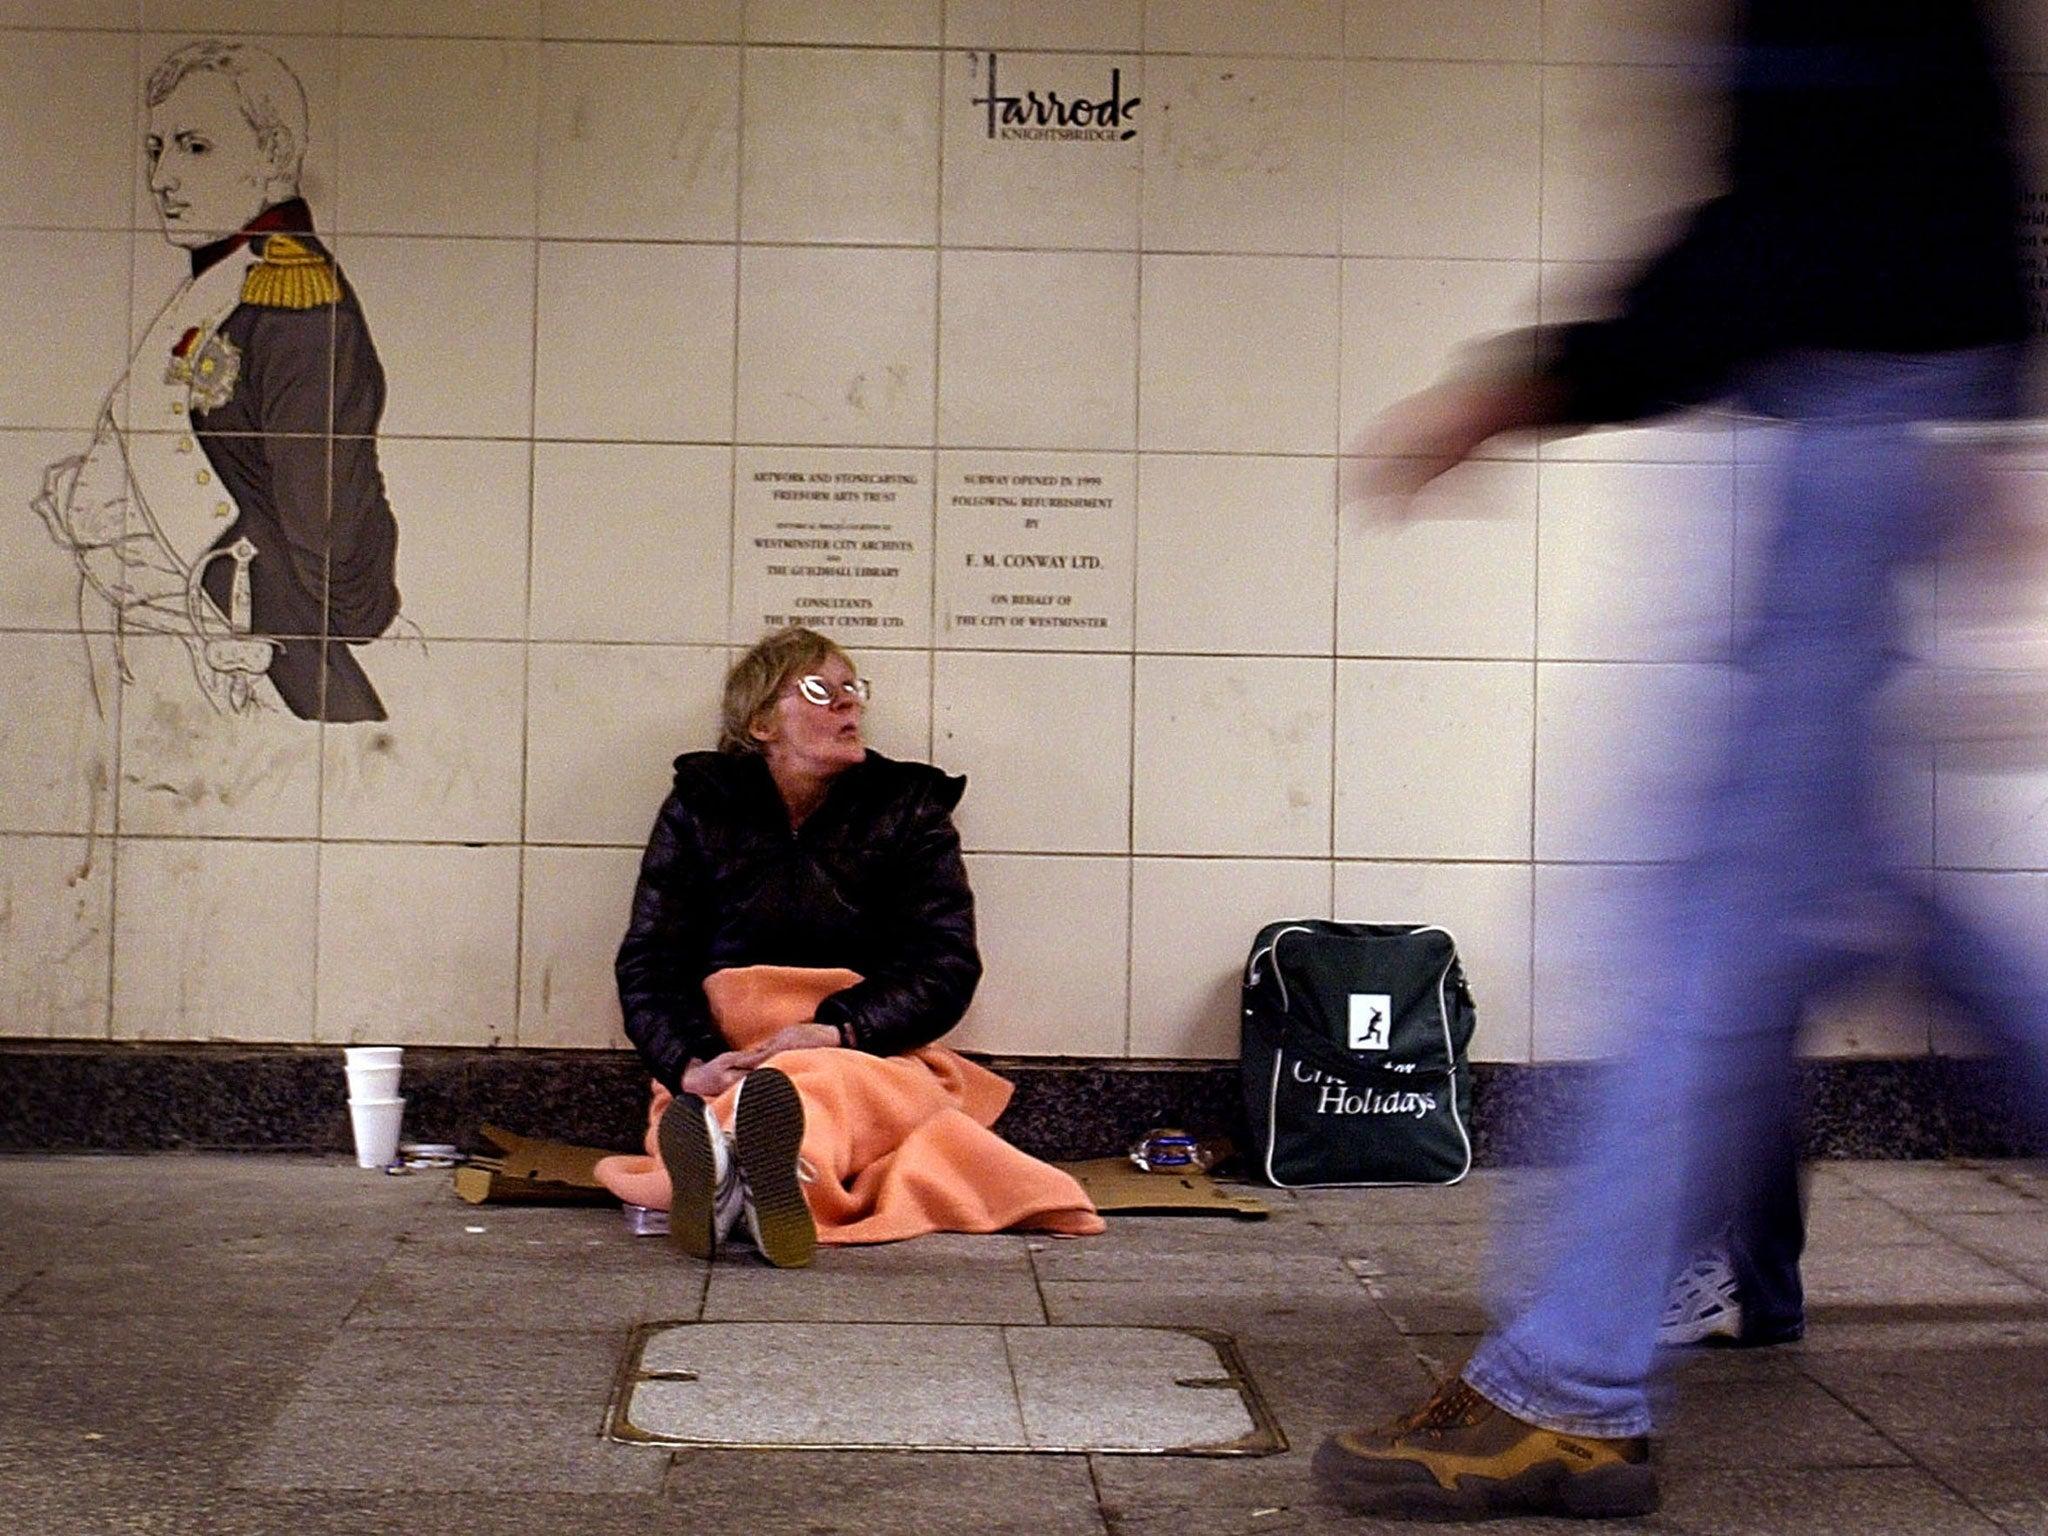 Dating site for homeless